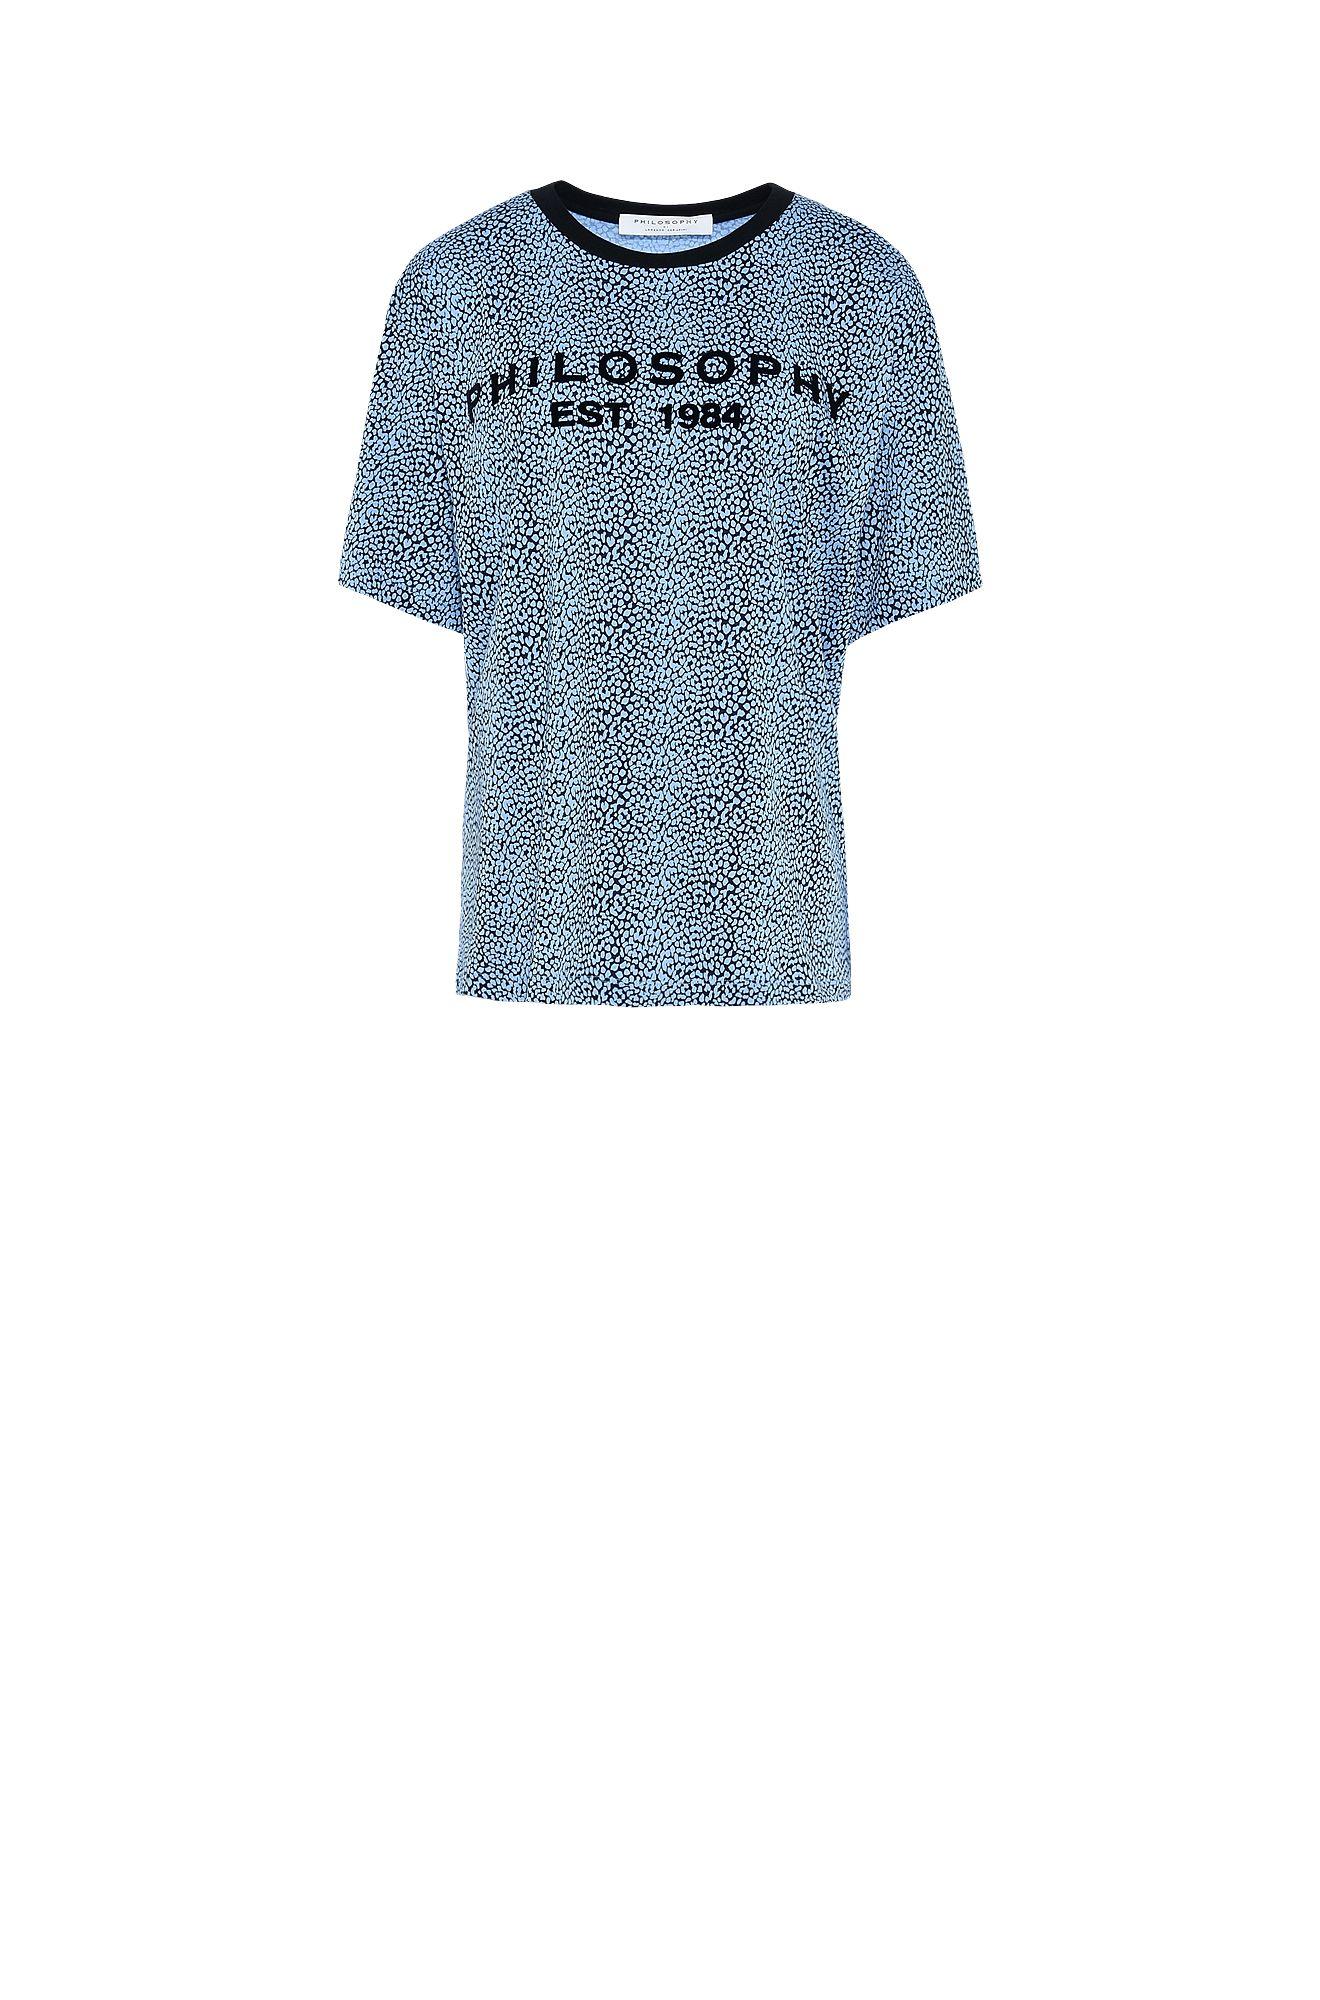 T-shirt bluette micro animalier